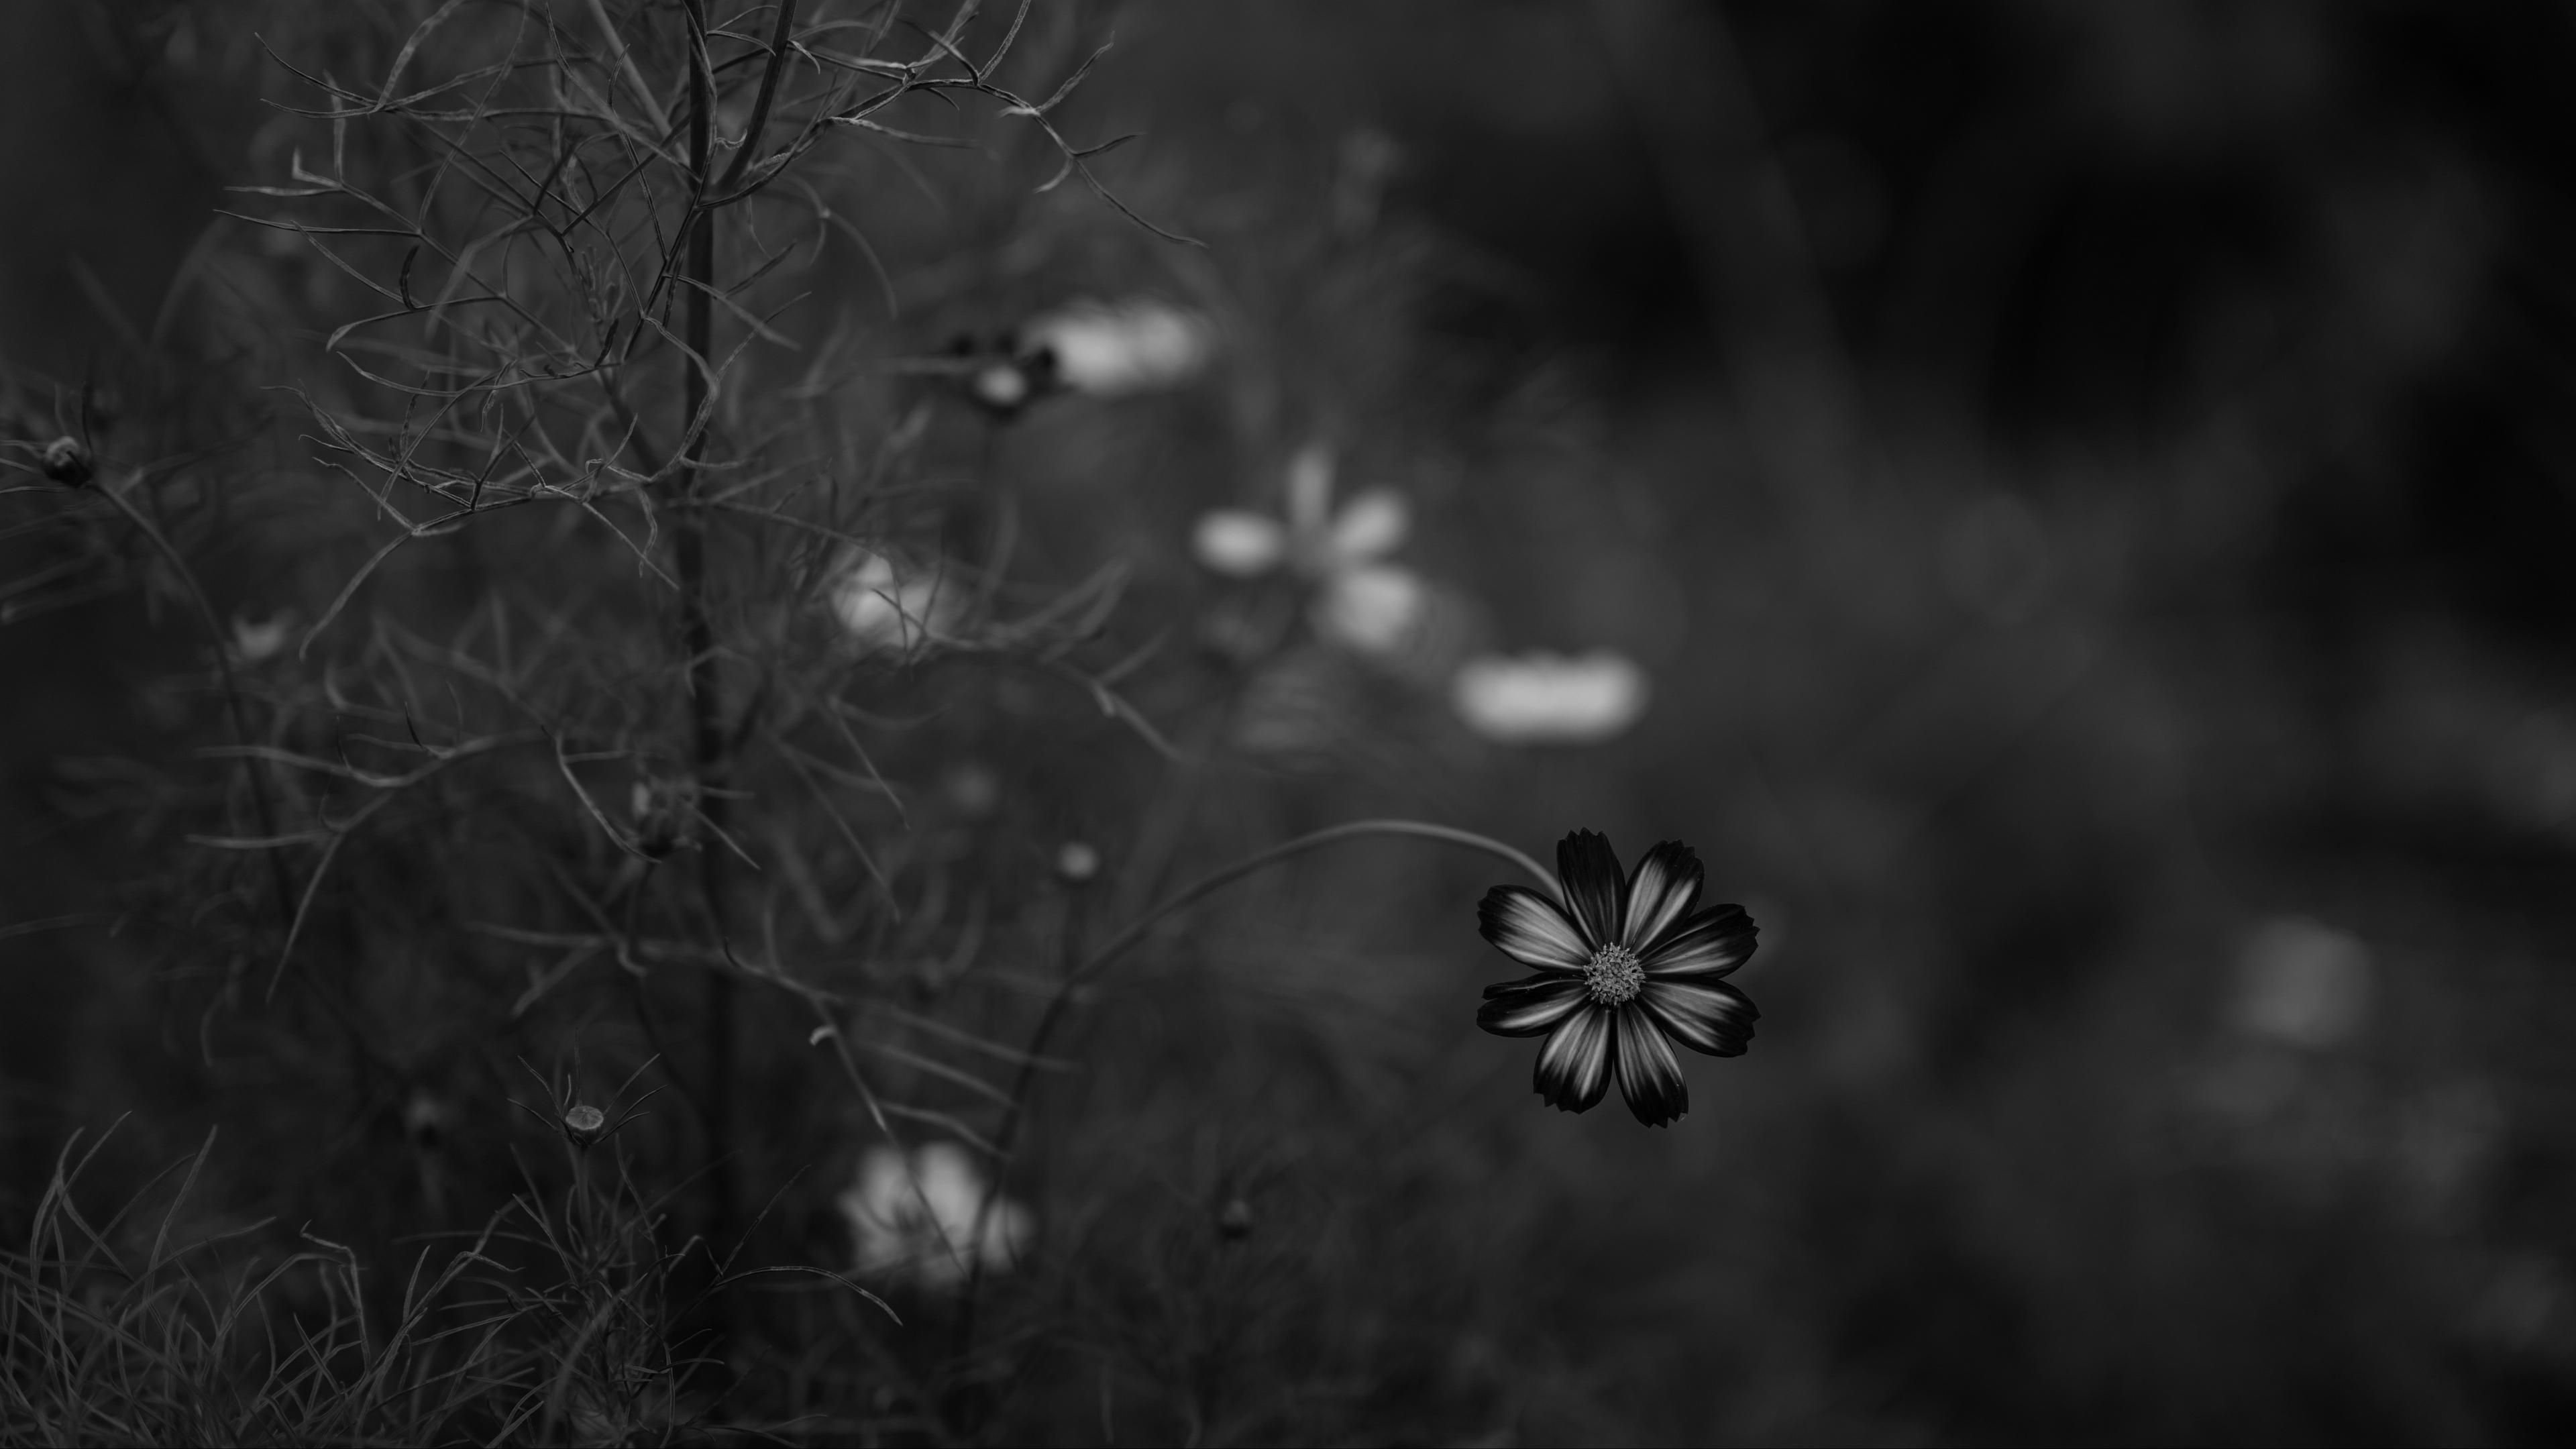 cosmos flower bw blur 4k 1540064751 - cosmos, flower, bw, blur 4k - flower, Cosmos, bw